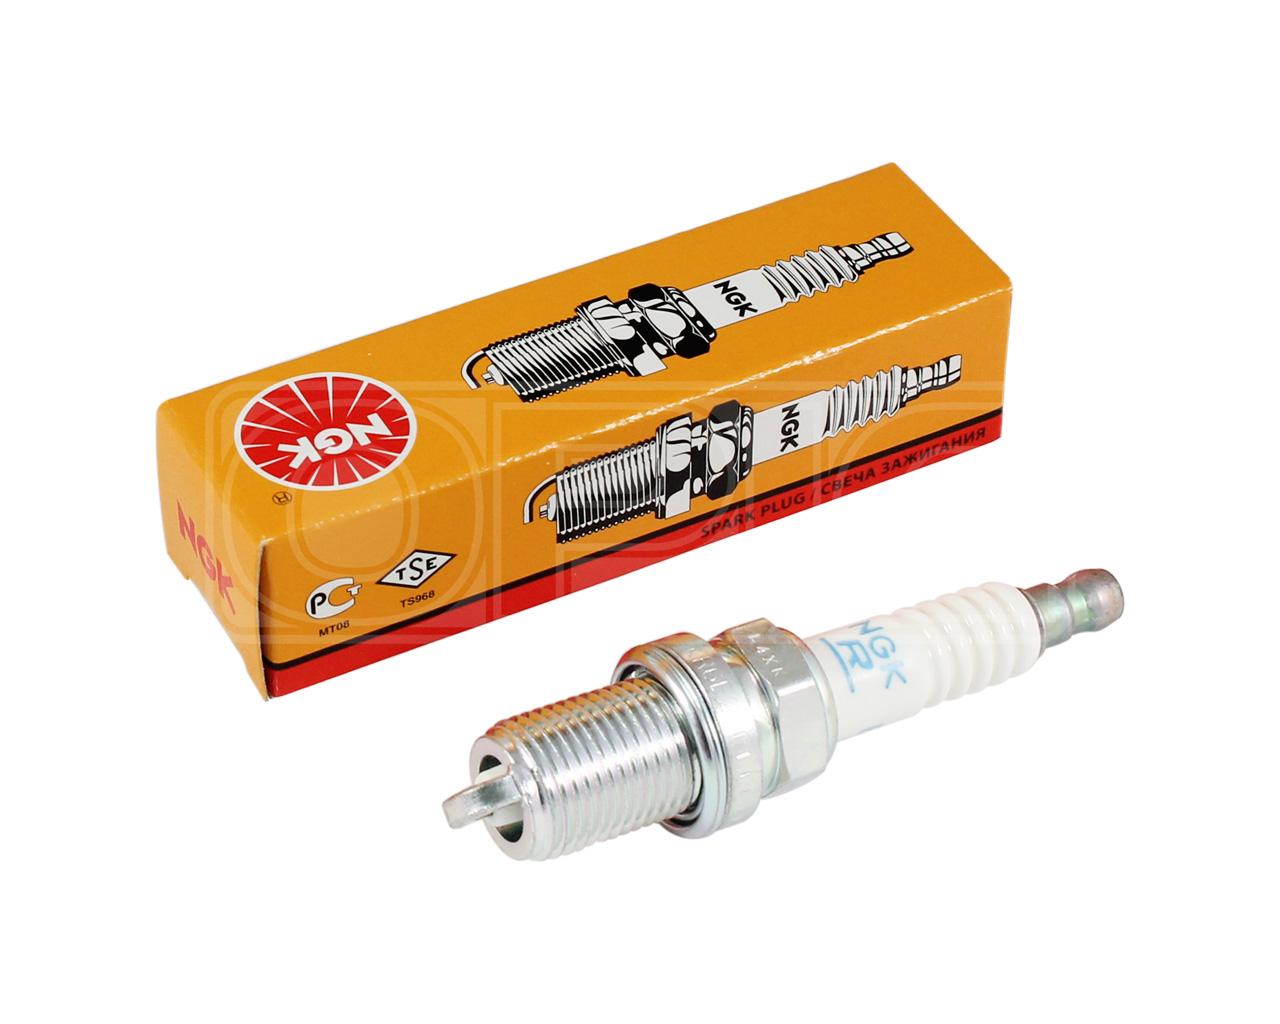 New Br7hs-10 Ngk Spark Plug Ngk Spark Plugs 1098